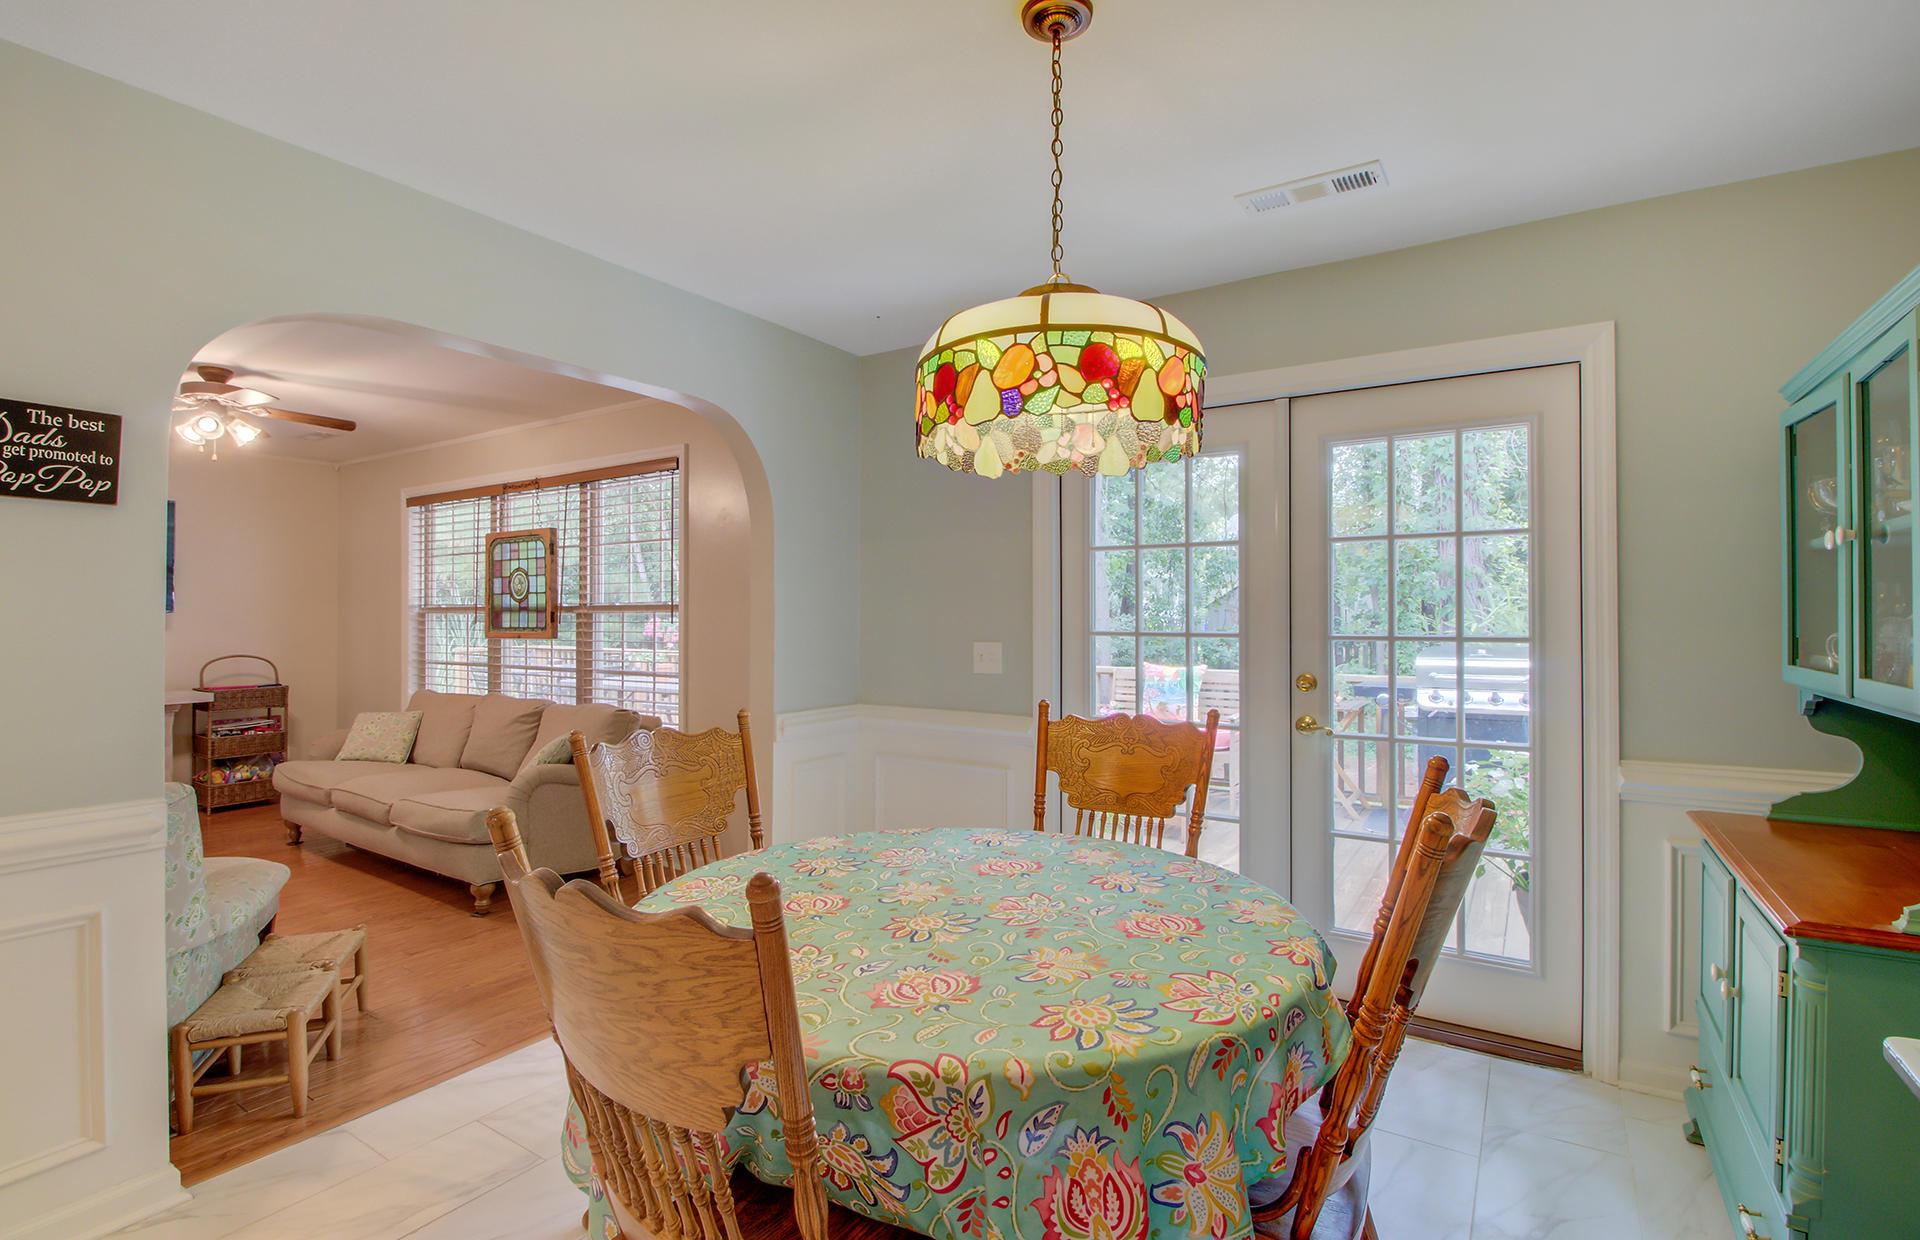 Park West Homes For Sale - 1500 Wellesley, Mount Pleasant, SC - 30